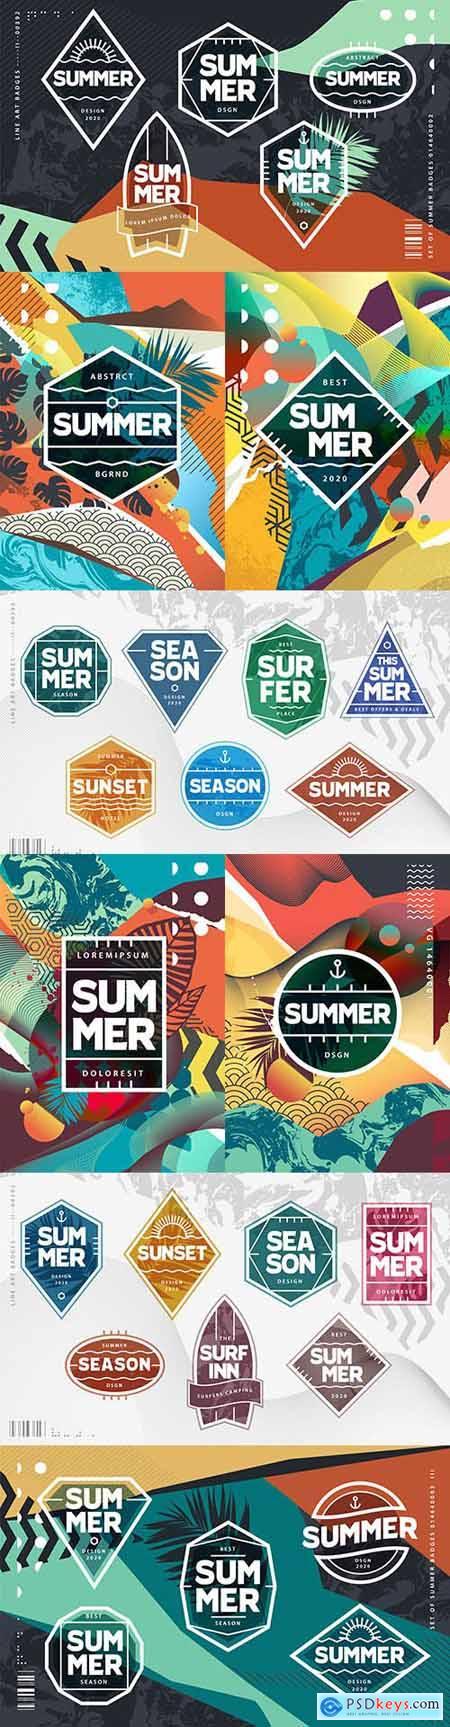 Summer grunge geometric tropical poster design modern